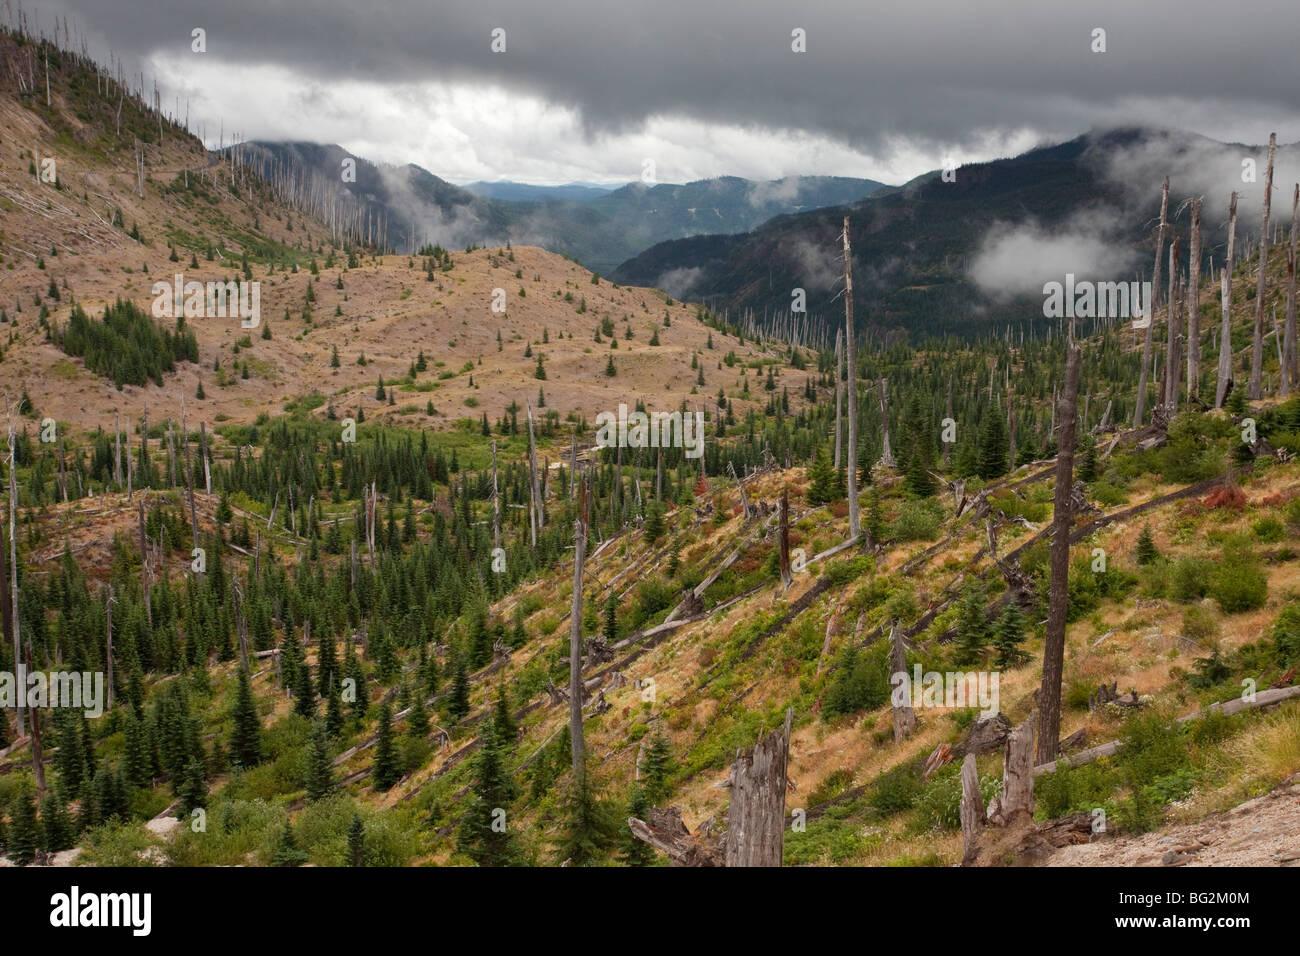 Burnt coniferous forest regenerating following eruption, on Mount St Helens National Park, Washington, USA, North - Stock Image